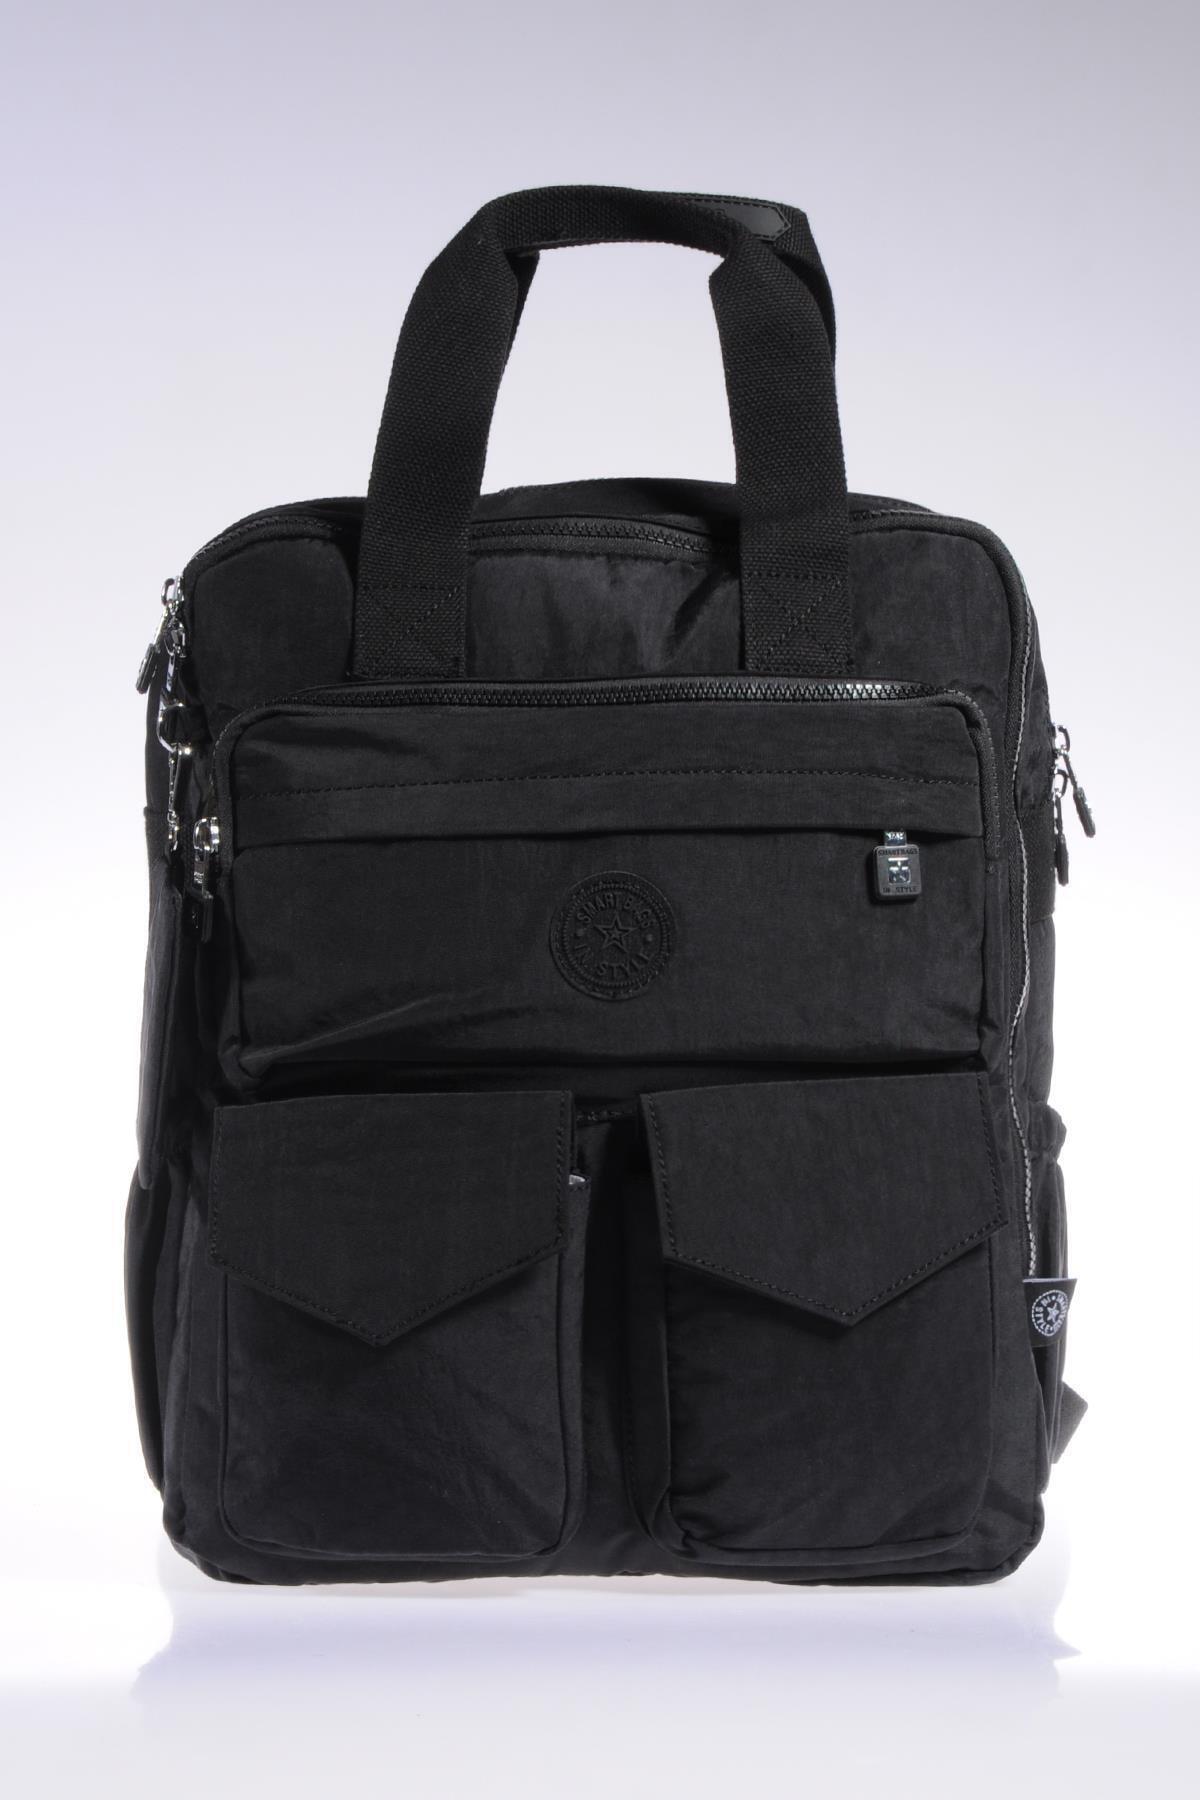 SMART BAGS Smb1175-0001 Siyah Kadın Sırt Çantası 1